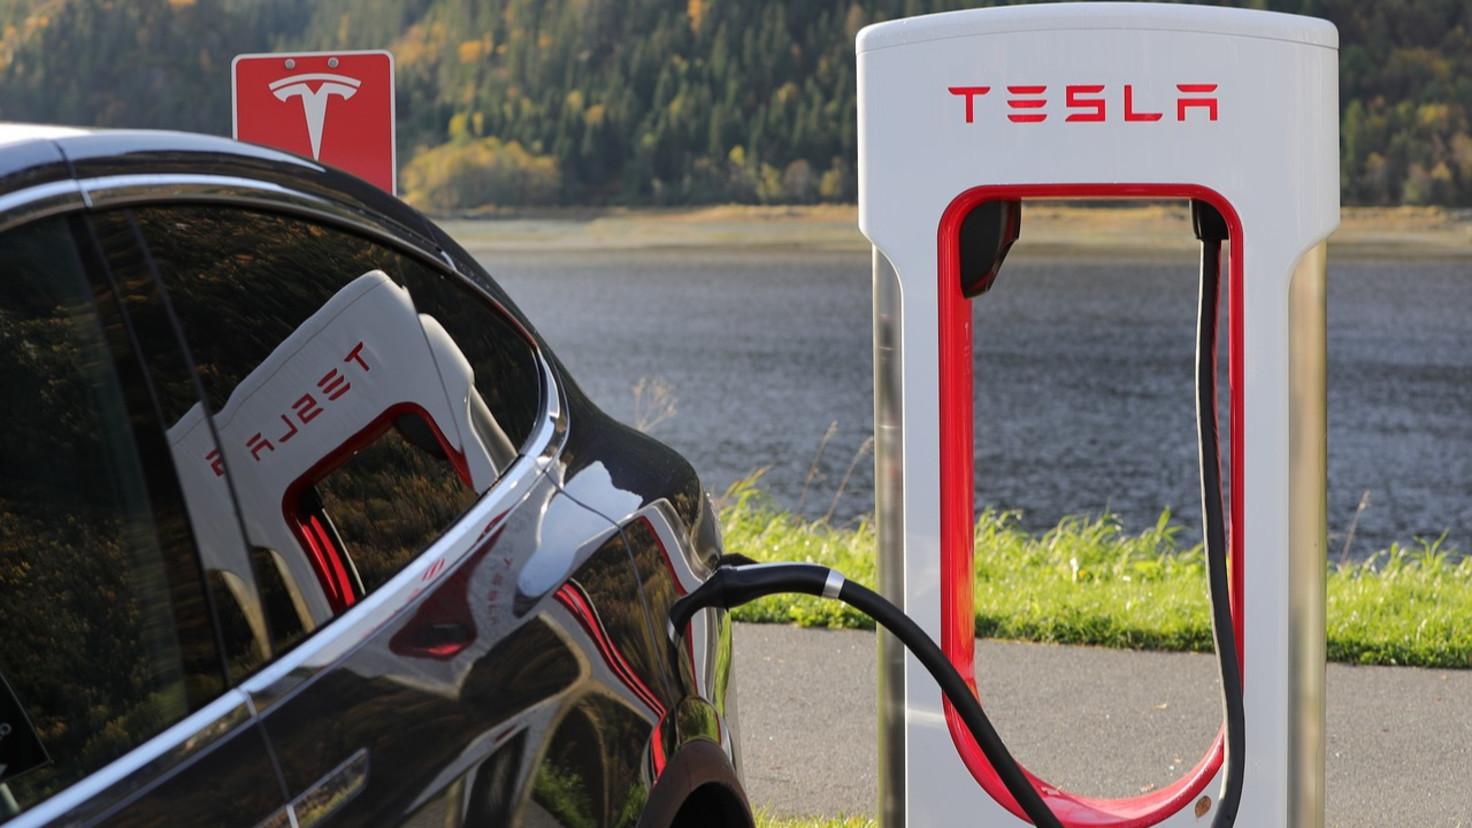 Goldman Sachs Cuts Tesla Stock Price Target Down to $158